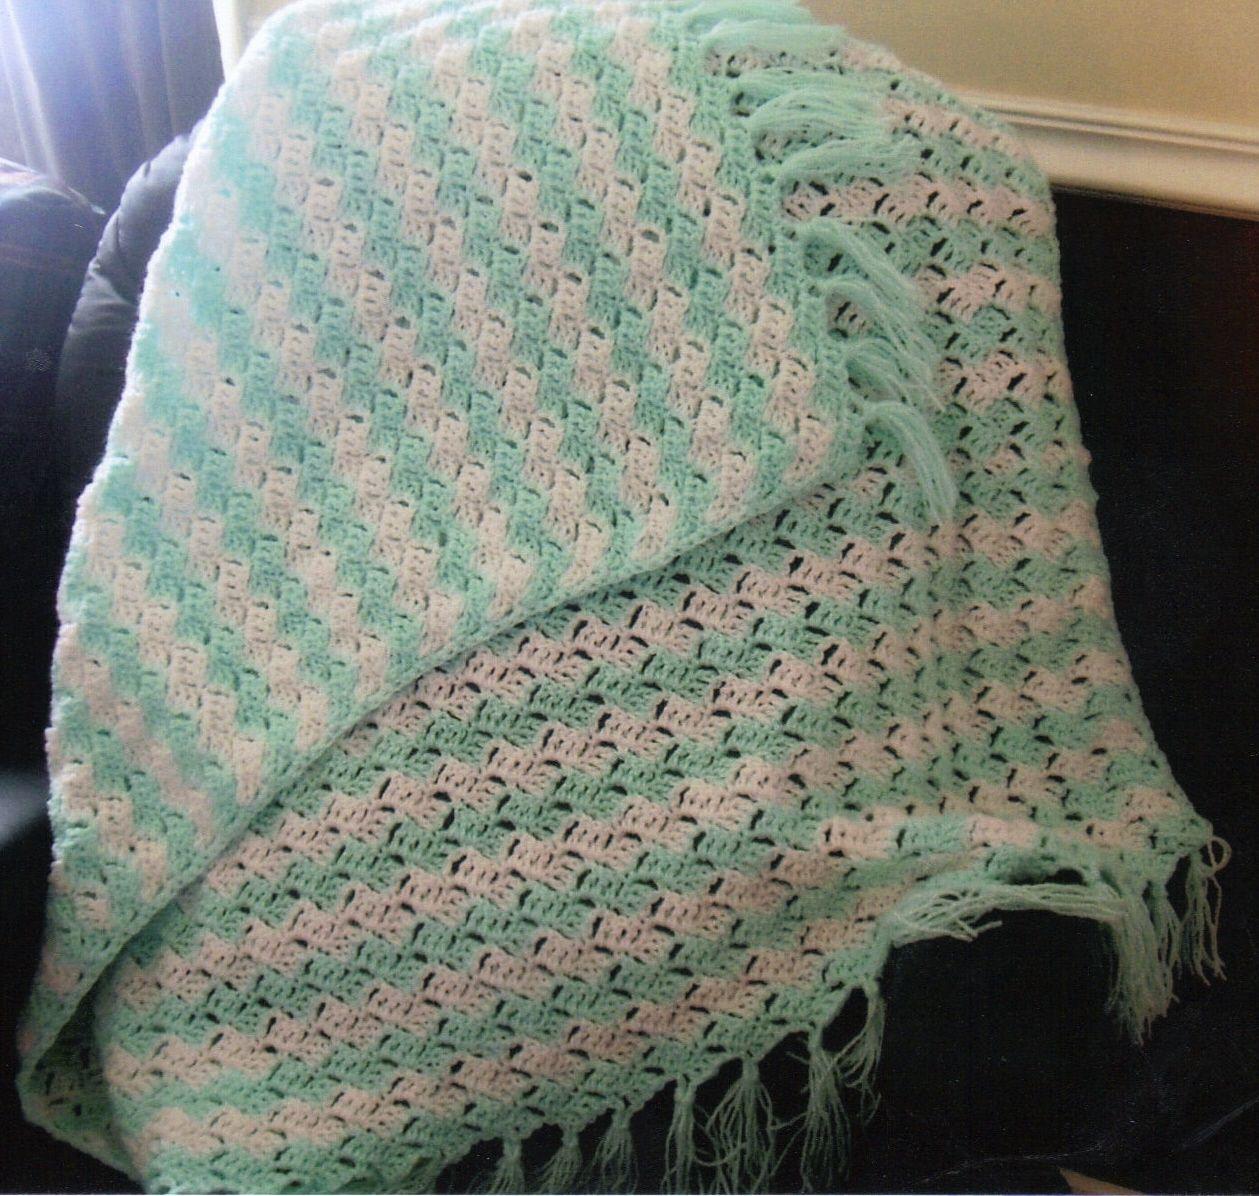 Brick Stitch Afghan Pattern | Crafty Crochet & Knitting | Pinterest